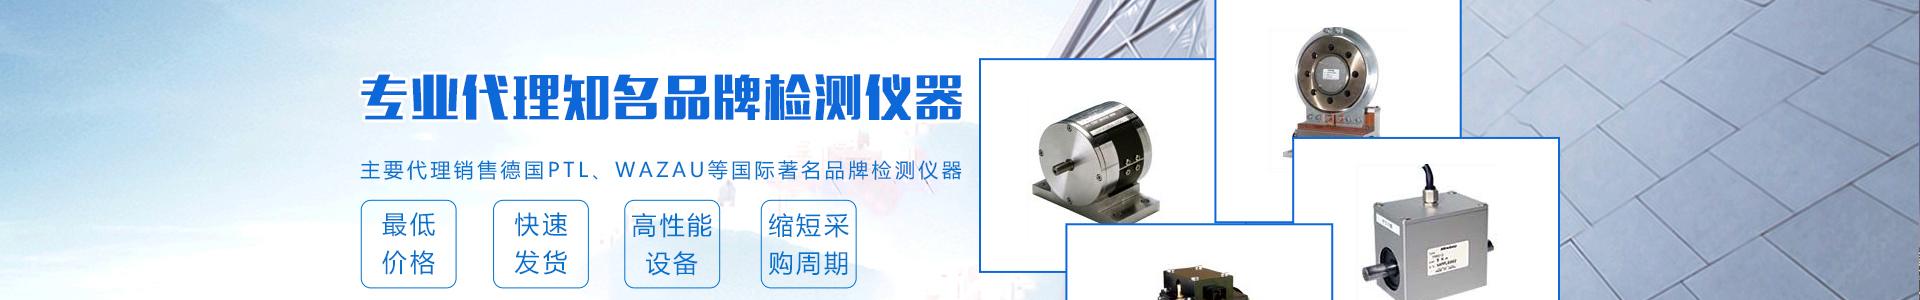 http://www.zhijian-china.com/data/upload/201912/20191223225403_481.jpg